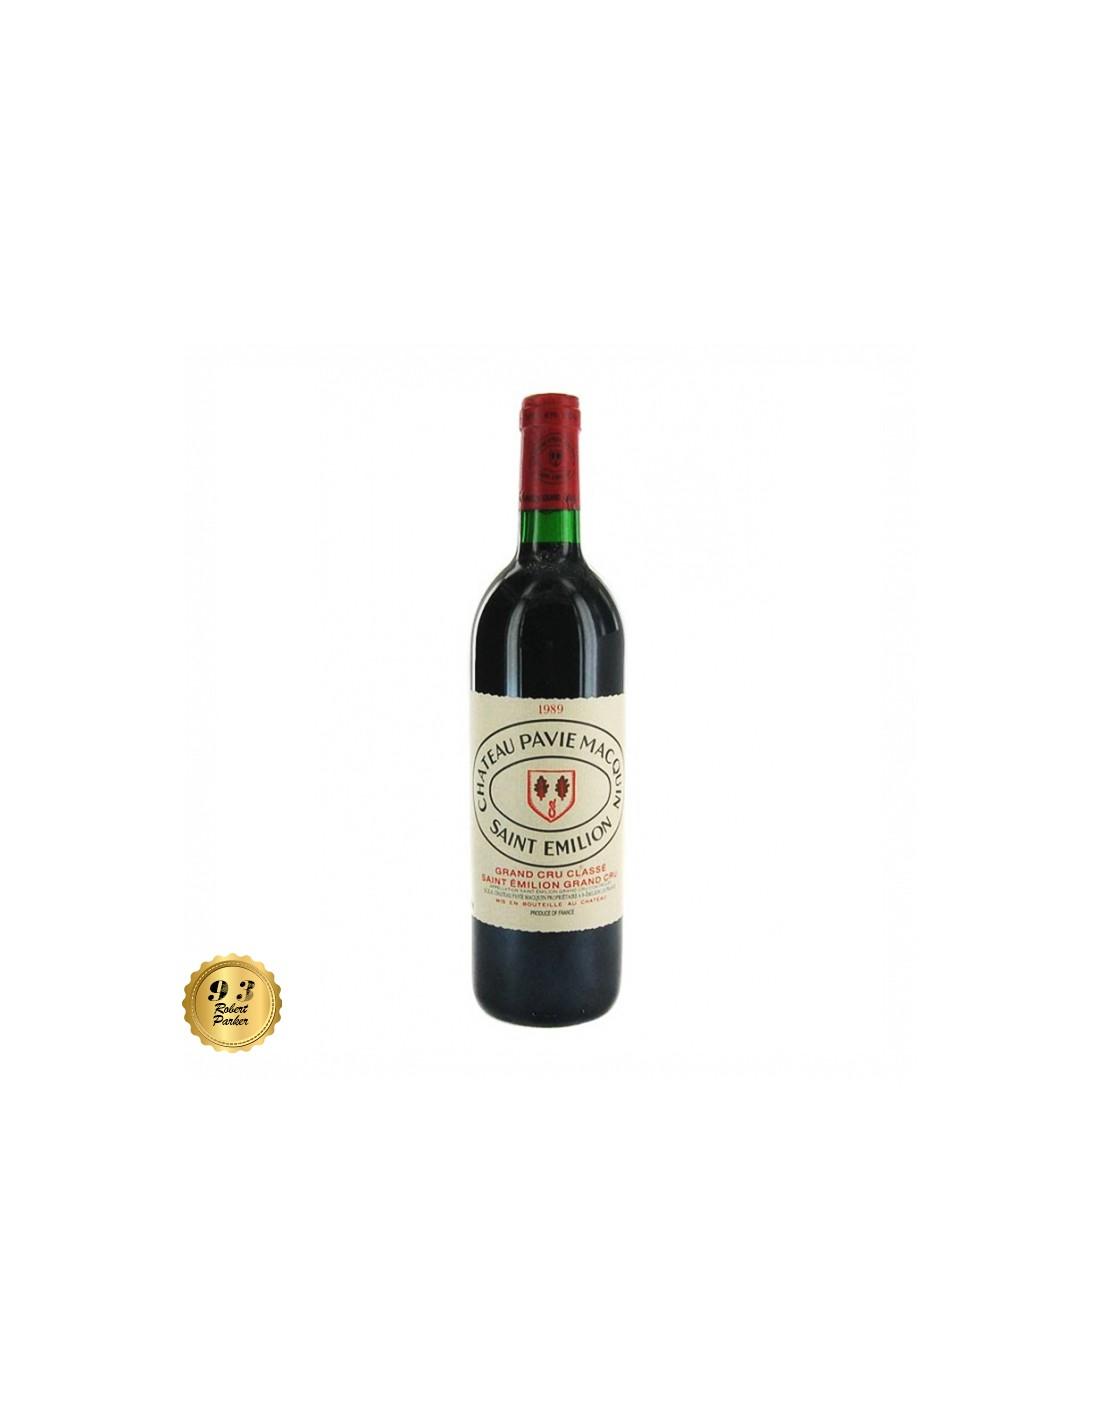 Vin rosu, Cupaj, Château Pavie Macquin Saint-Émilion, 0.75L, 14.5% alc., Franta